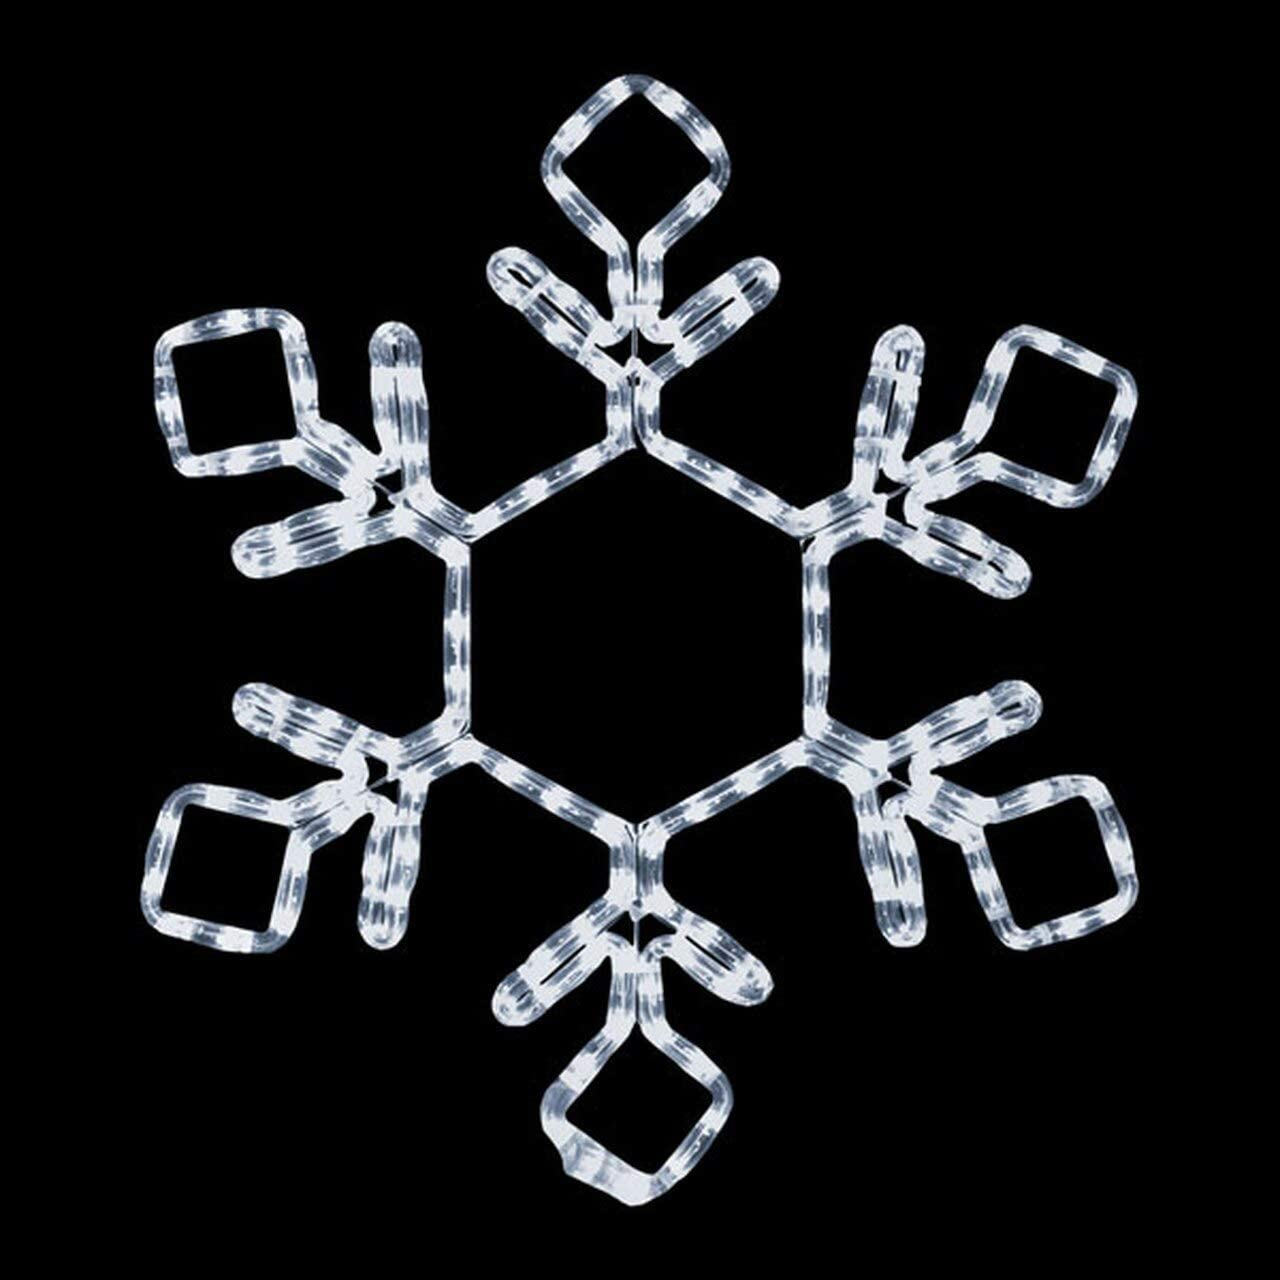 ElectricArt 18 Inch Cool White LED Rope Light Snowflake Motif v2